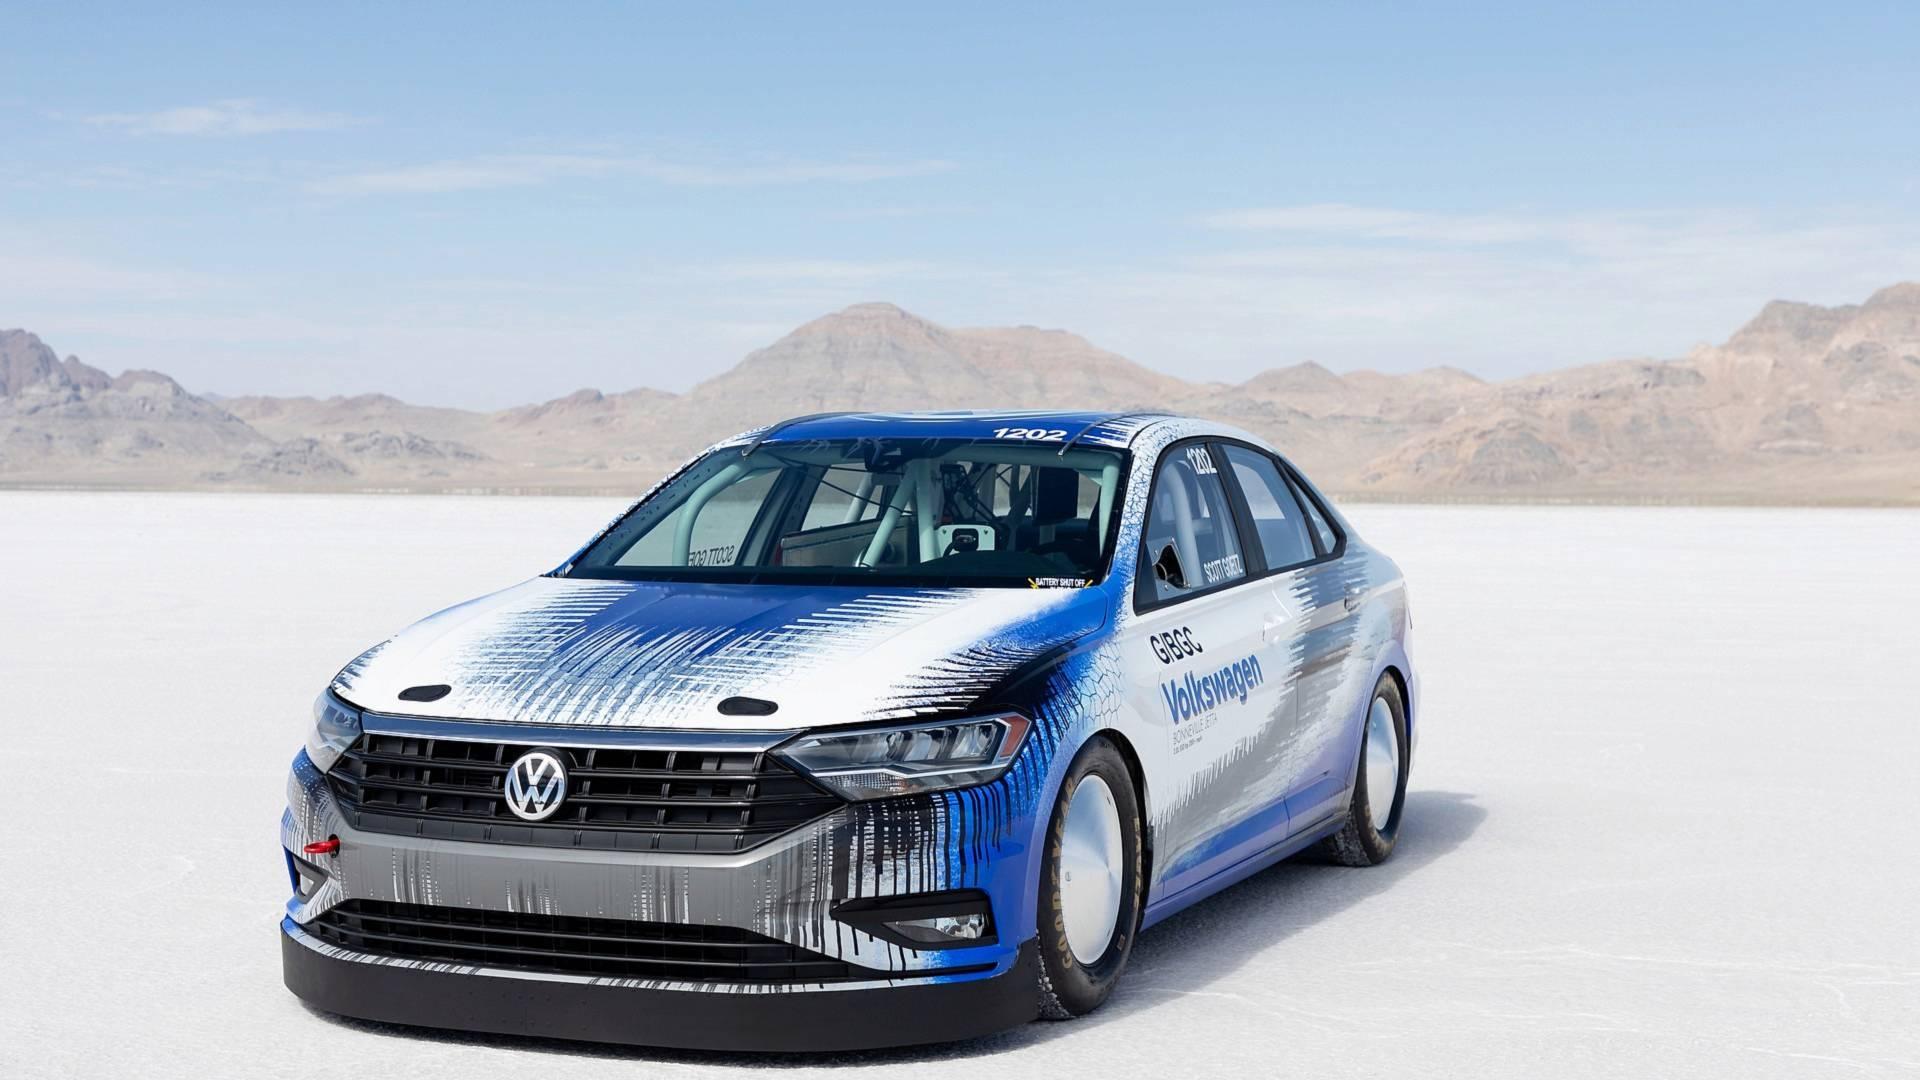 Volkswagen Jetta установил рекорд скорости на озере Бонневилль 1